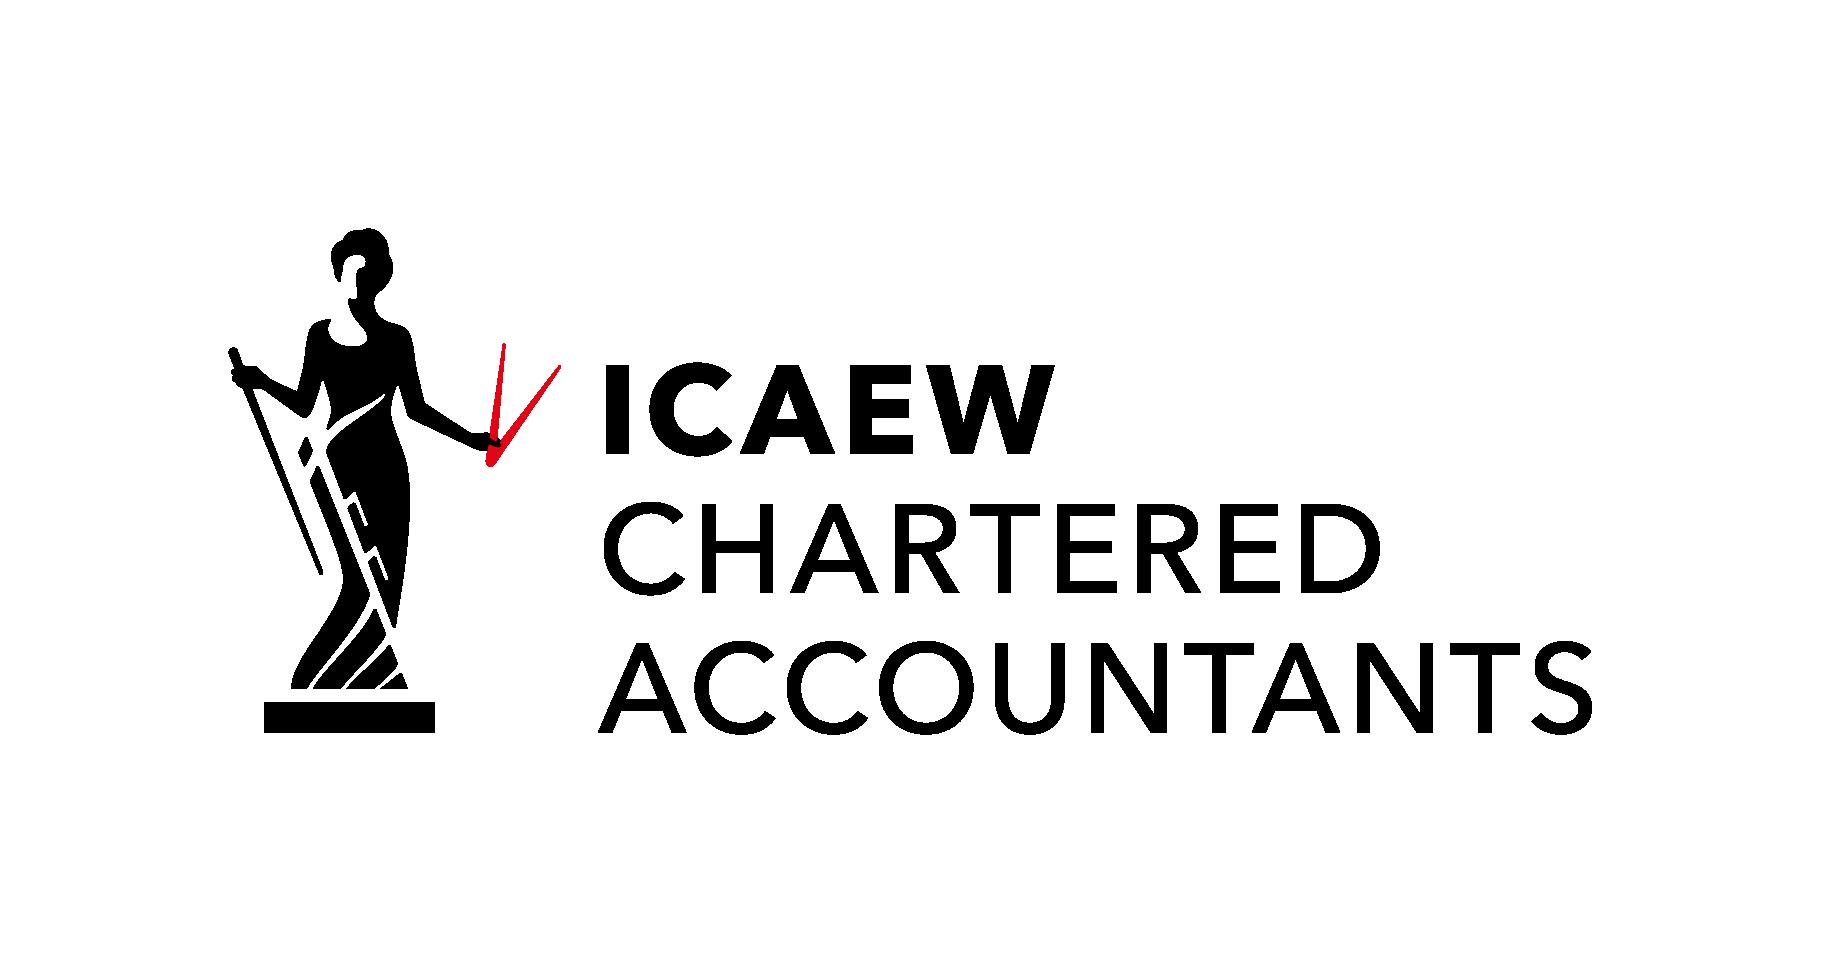 ICAEW_CharteredAccountants_BLK_RGB.PNG